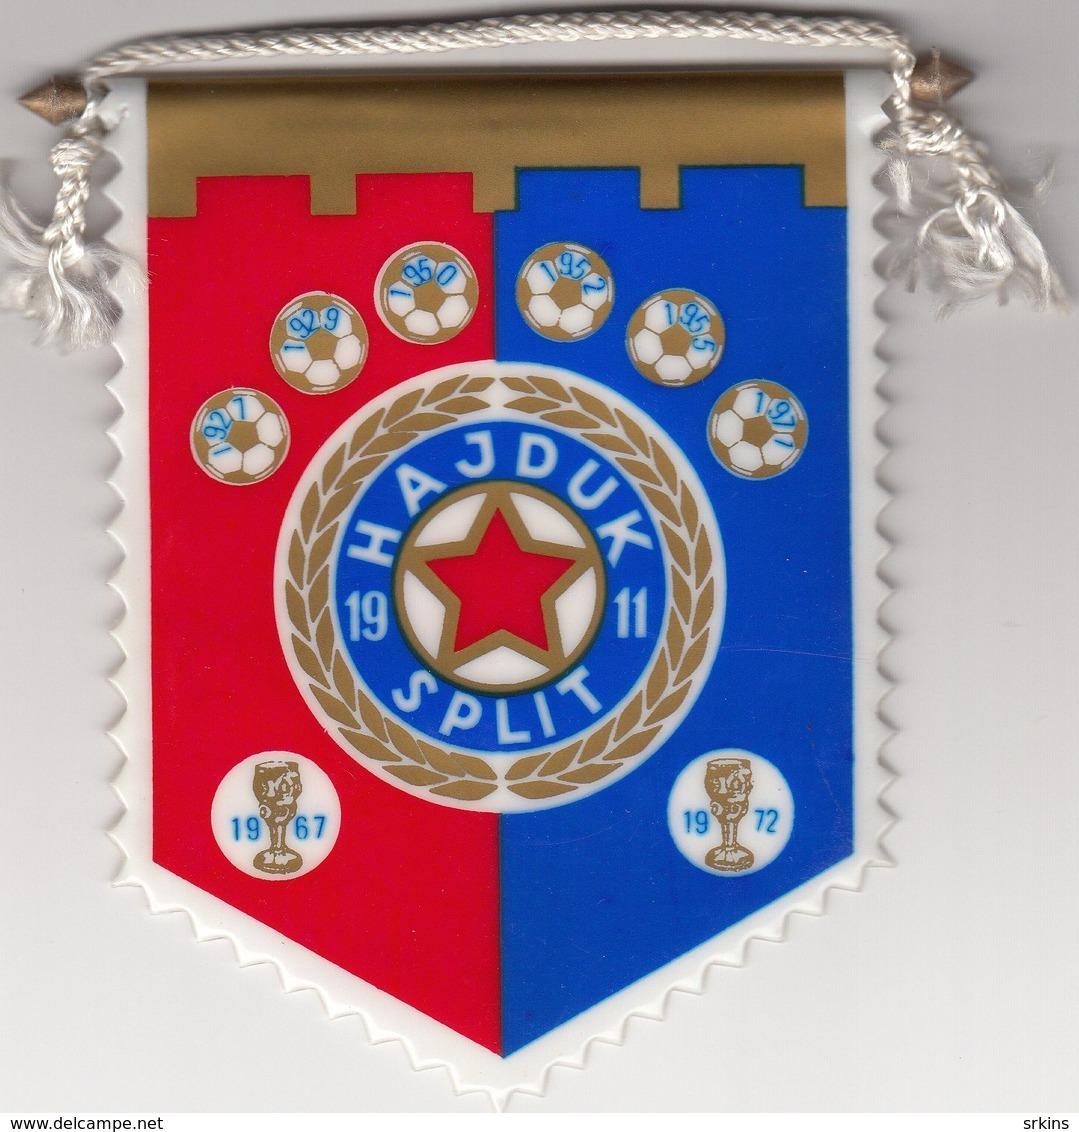 Pennant NK FC Hajduk Split Croatia Yugoslavia Football - Apparel, Souvenirs & Other